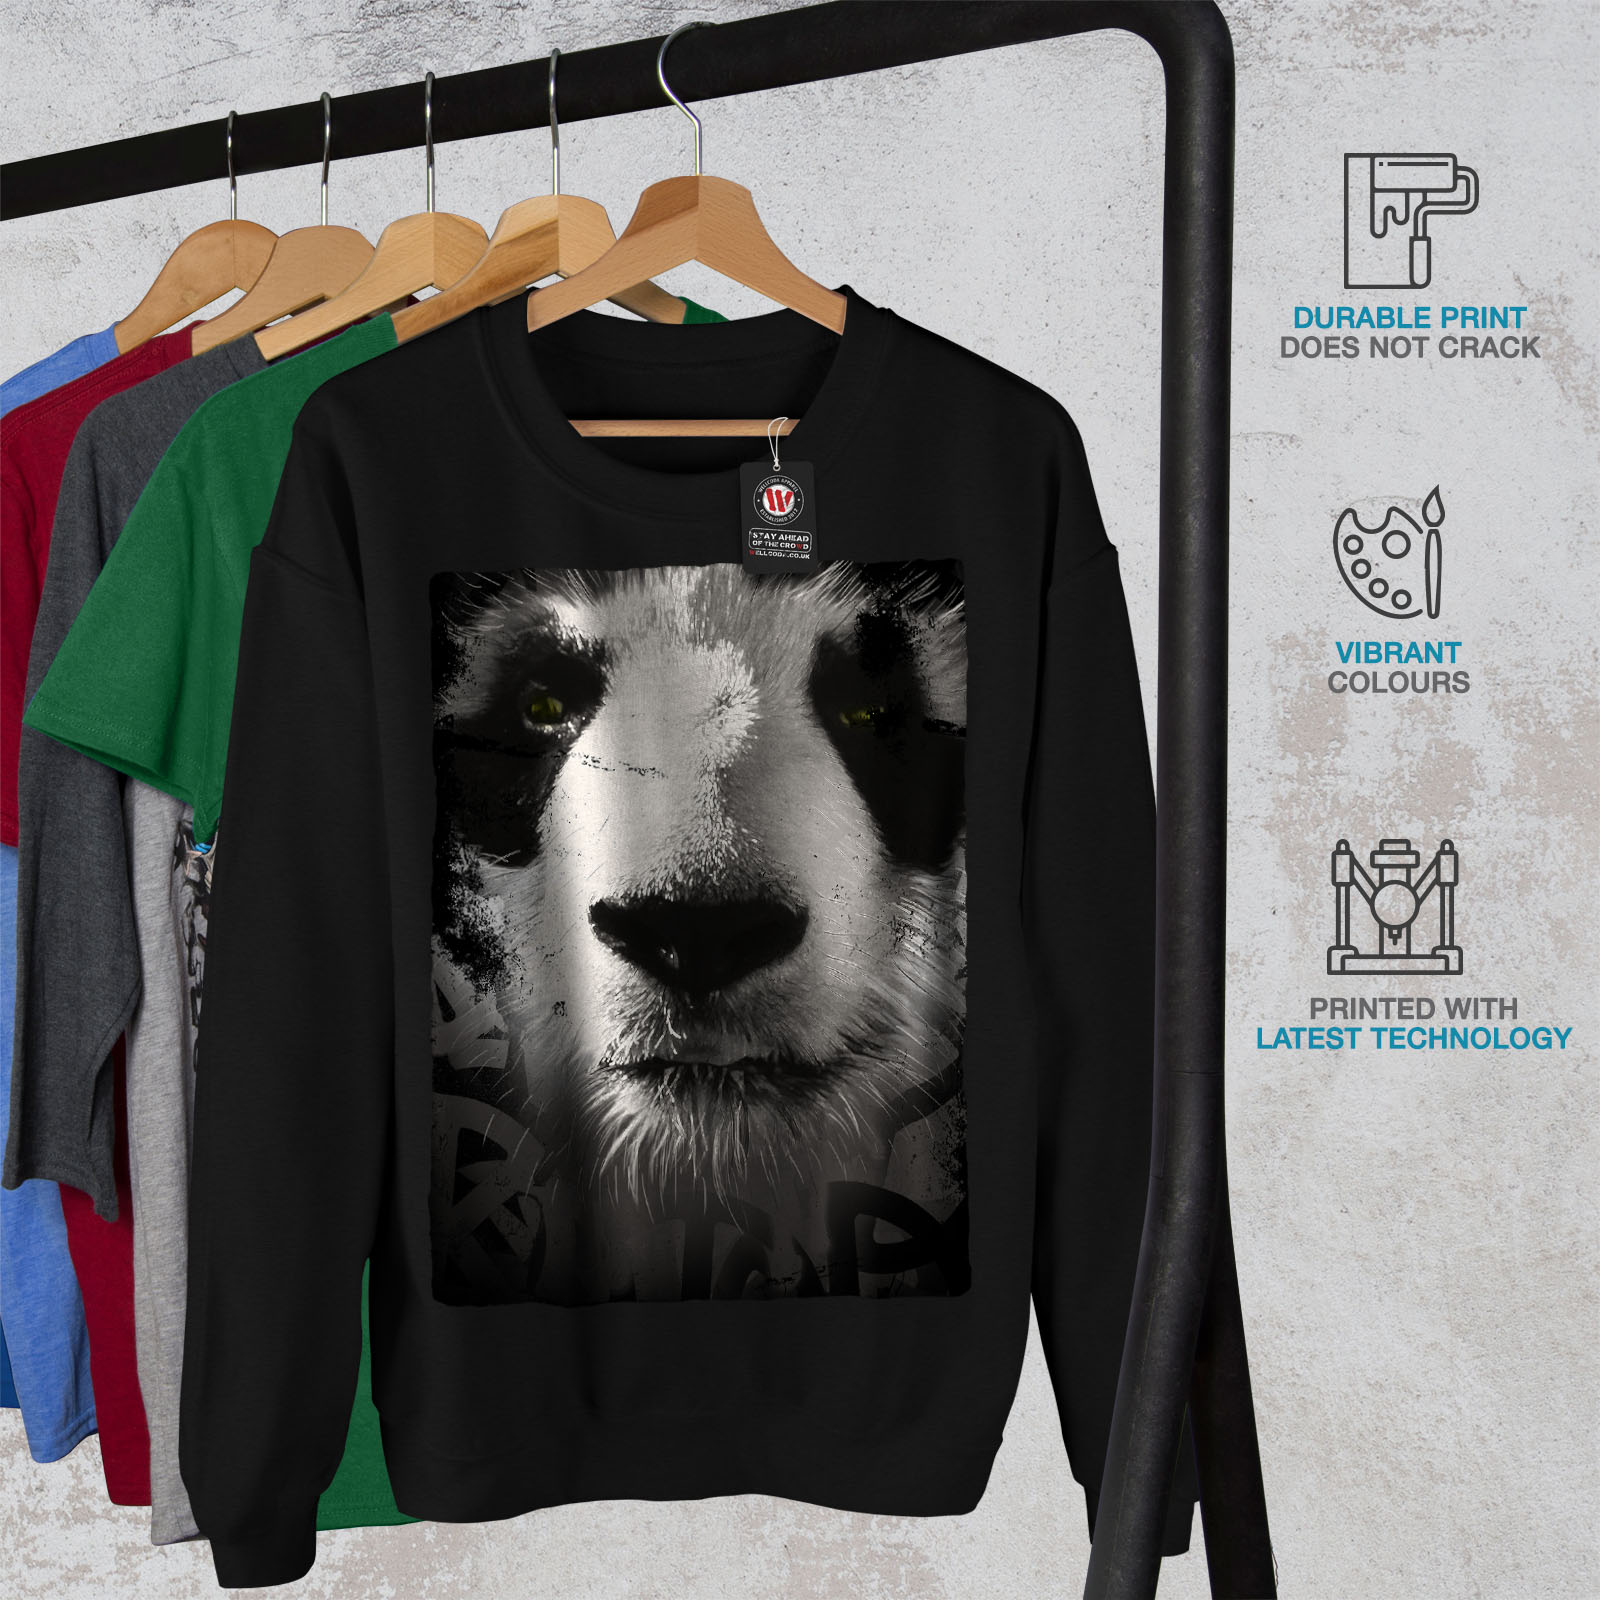 Wellcoda Cute Casual SweatshirtBella Panda Face Jumper Black Pullover KTlJcF1